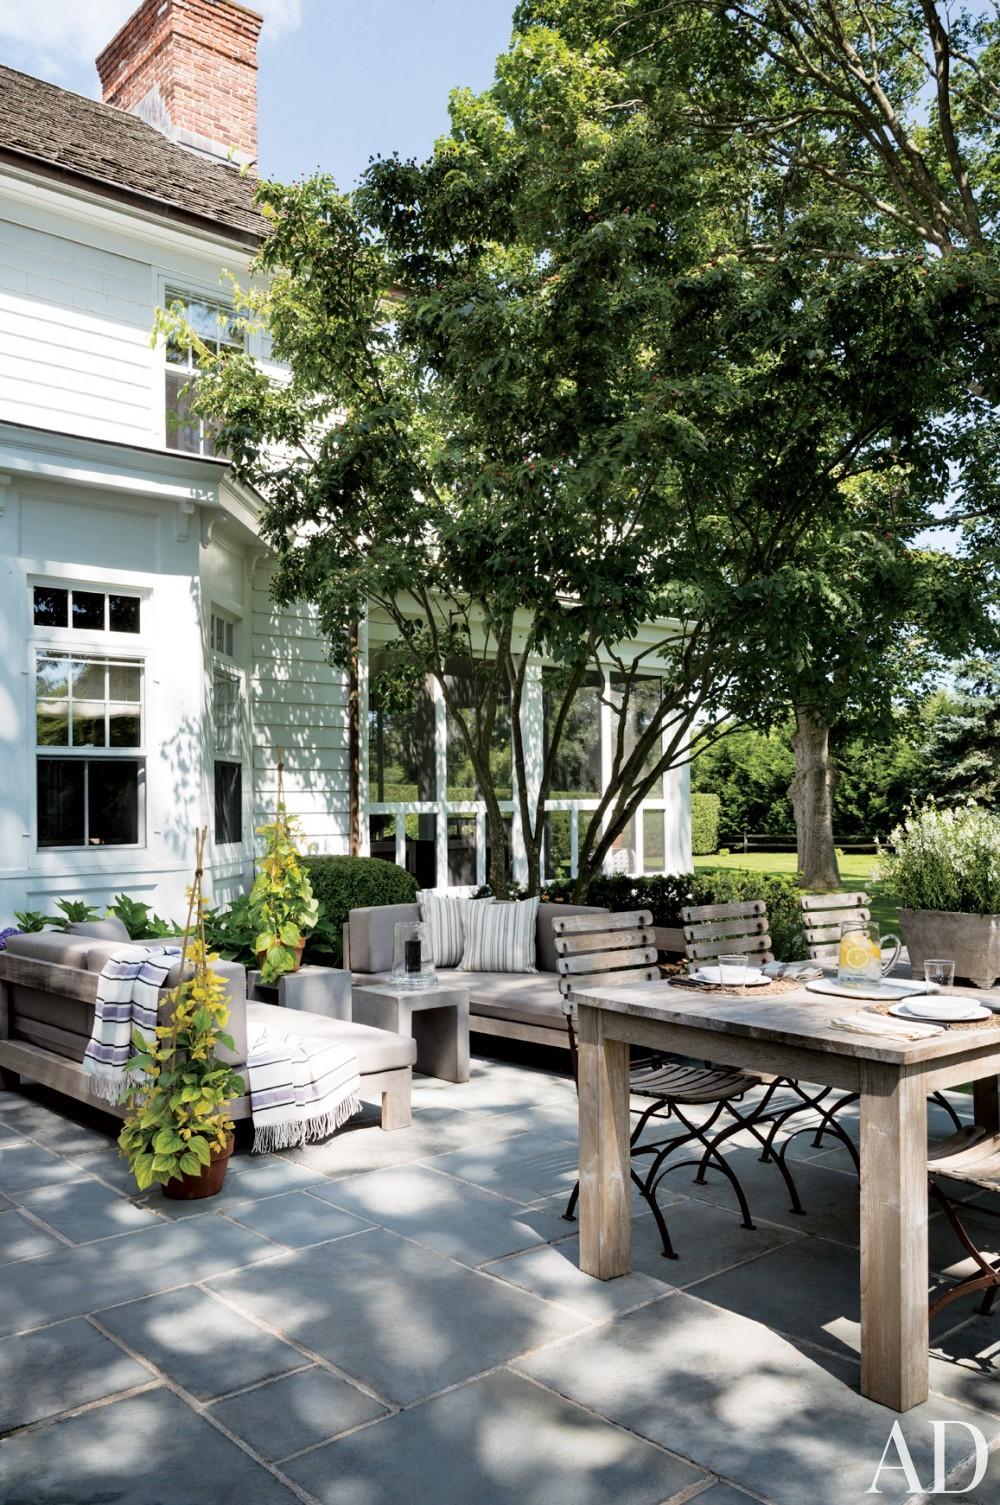 Contemporary Terrace by Rebecca Bond in Bridgehampton, New York